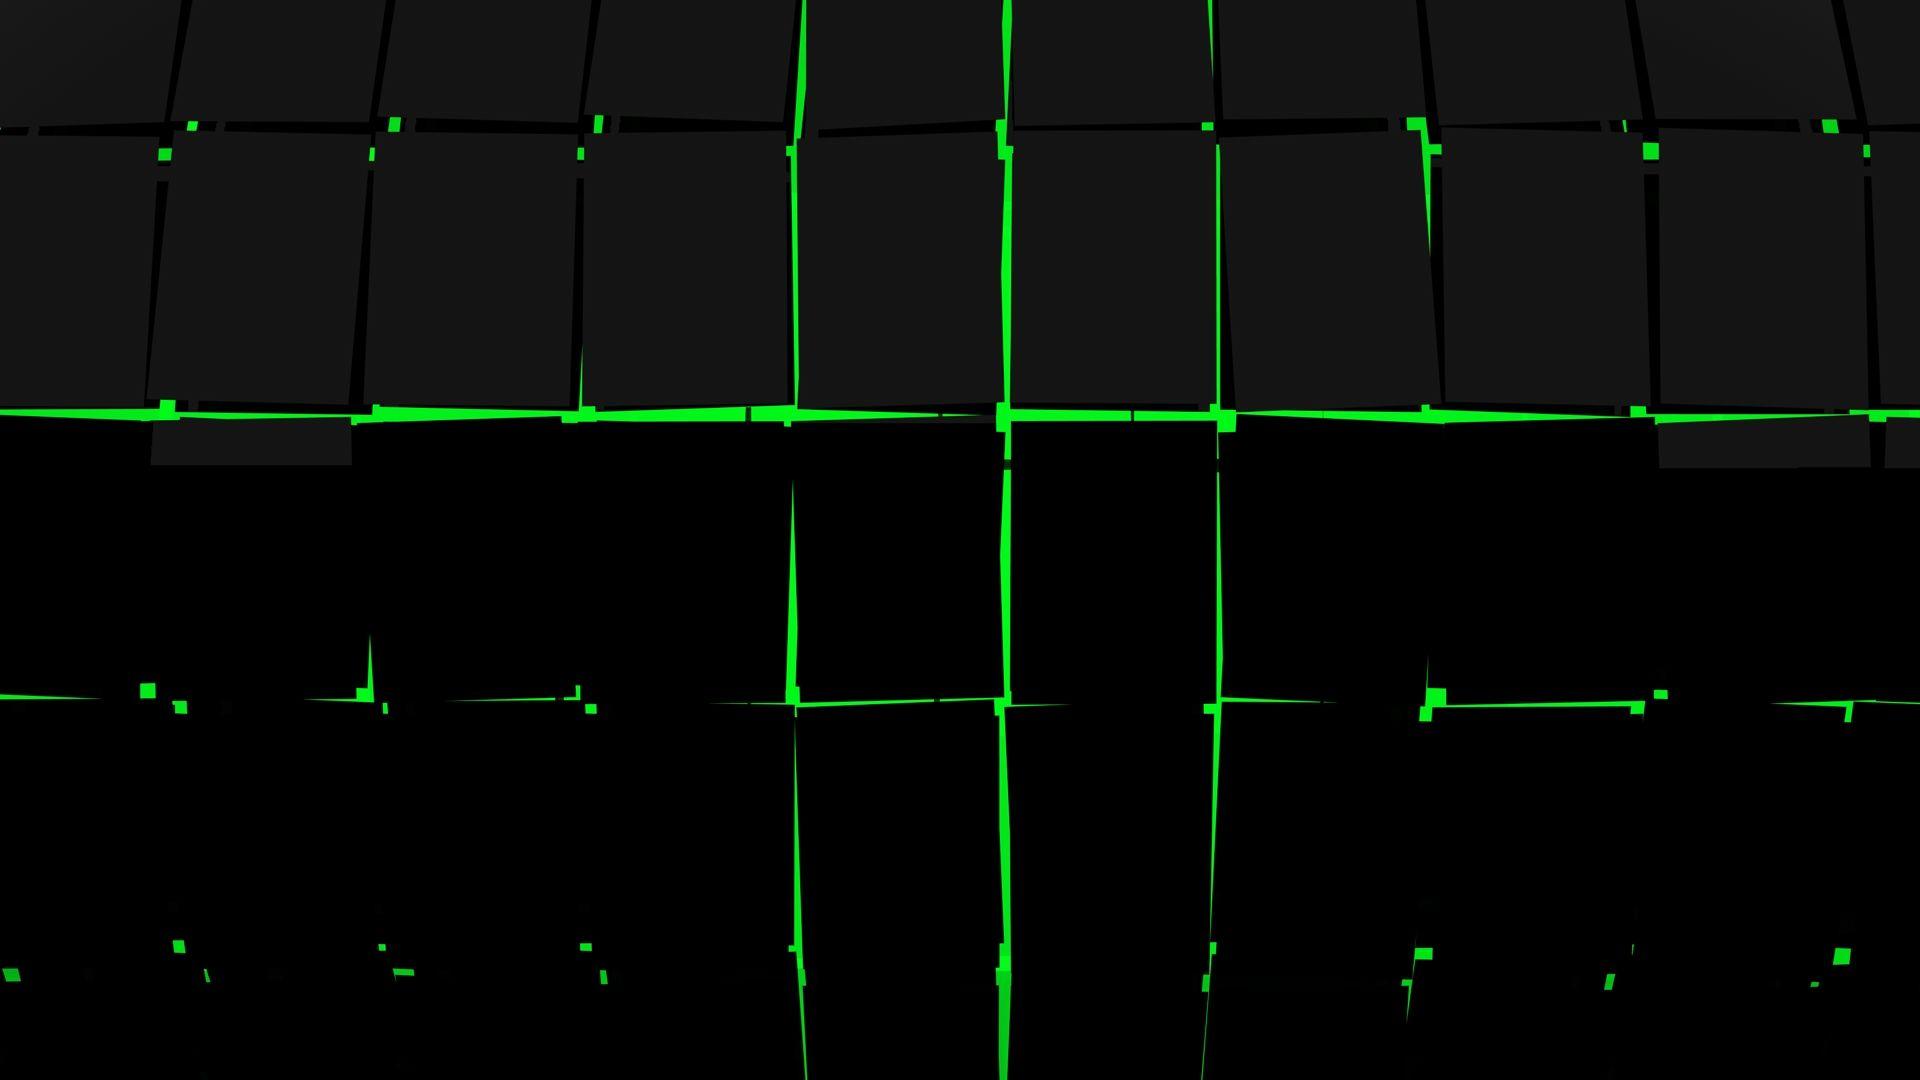 Abstract Dark Green Wallpaper Hd